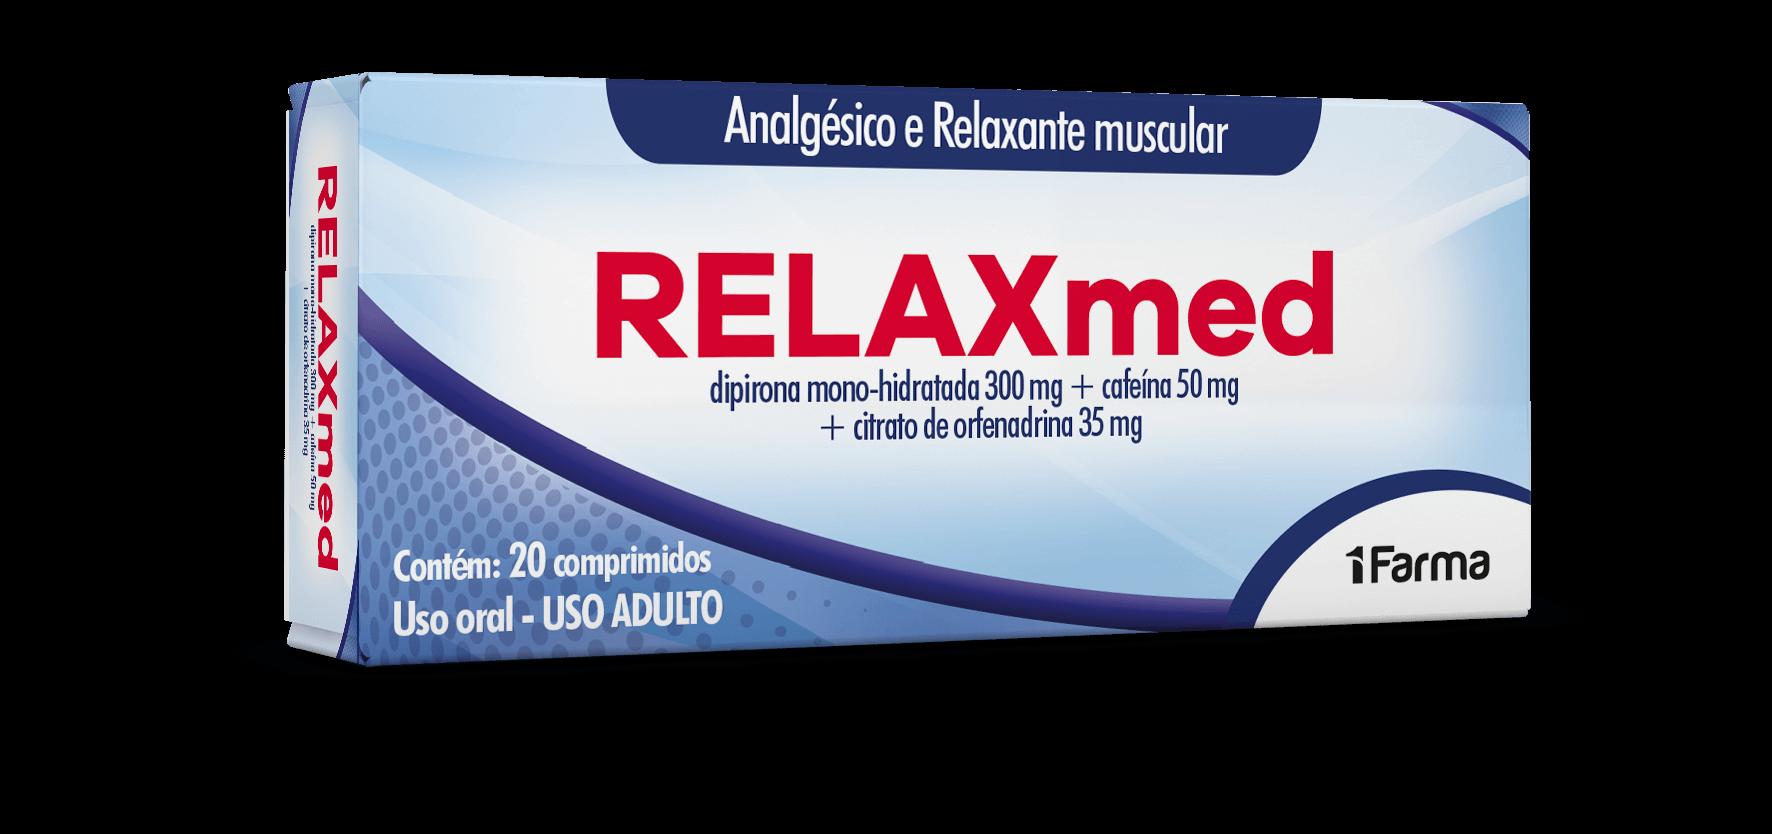 Imagem da embalagem do Relaxmed.